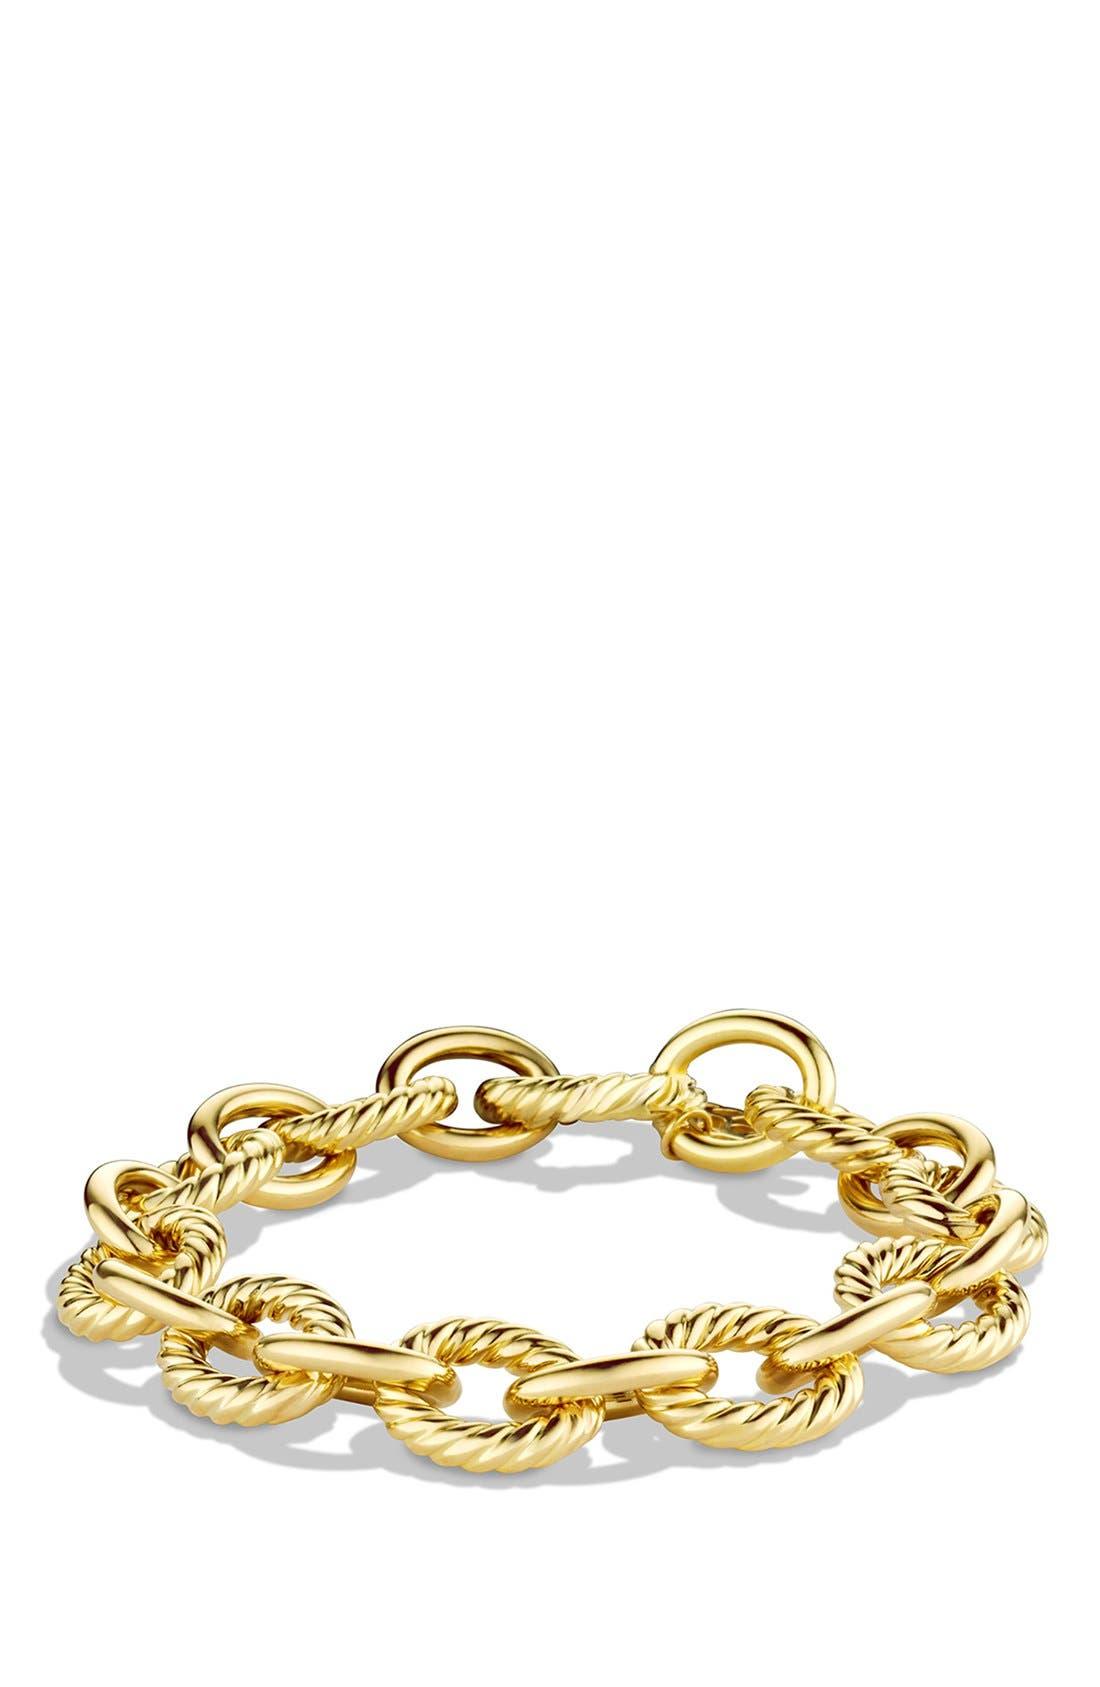 Main Image - David Yurman 'Oval' Large Link Bracelet in Gold